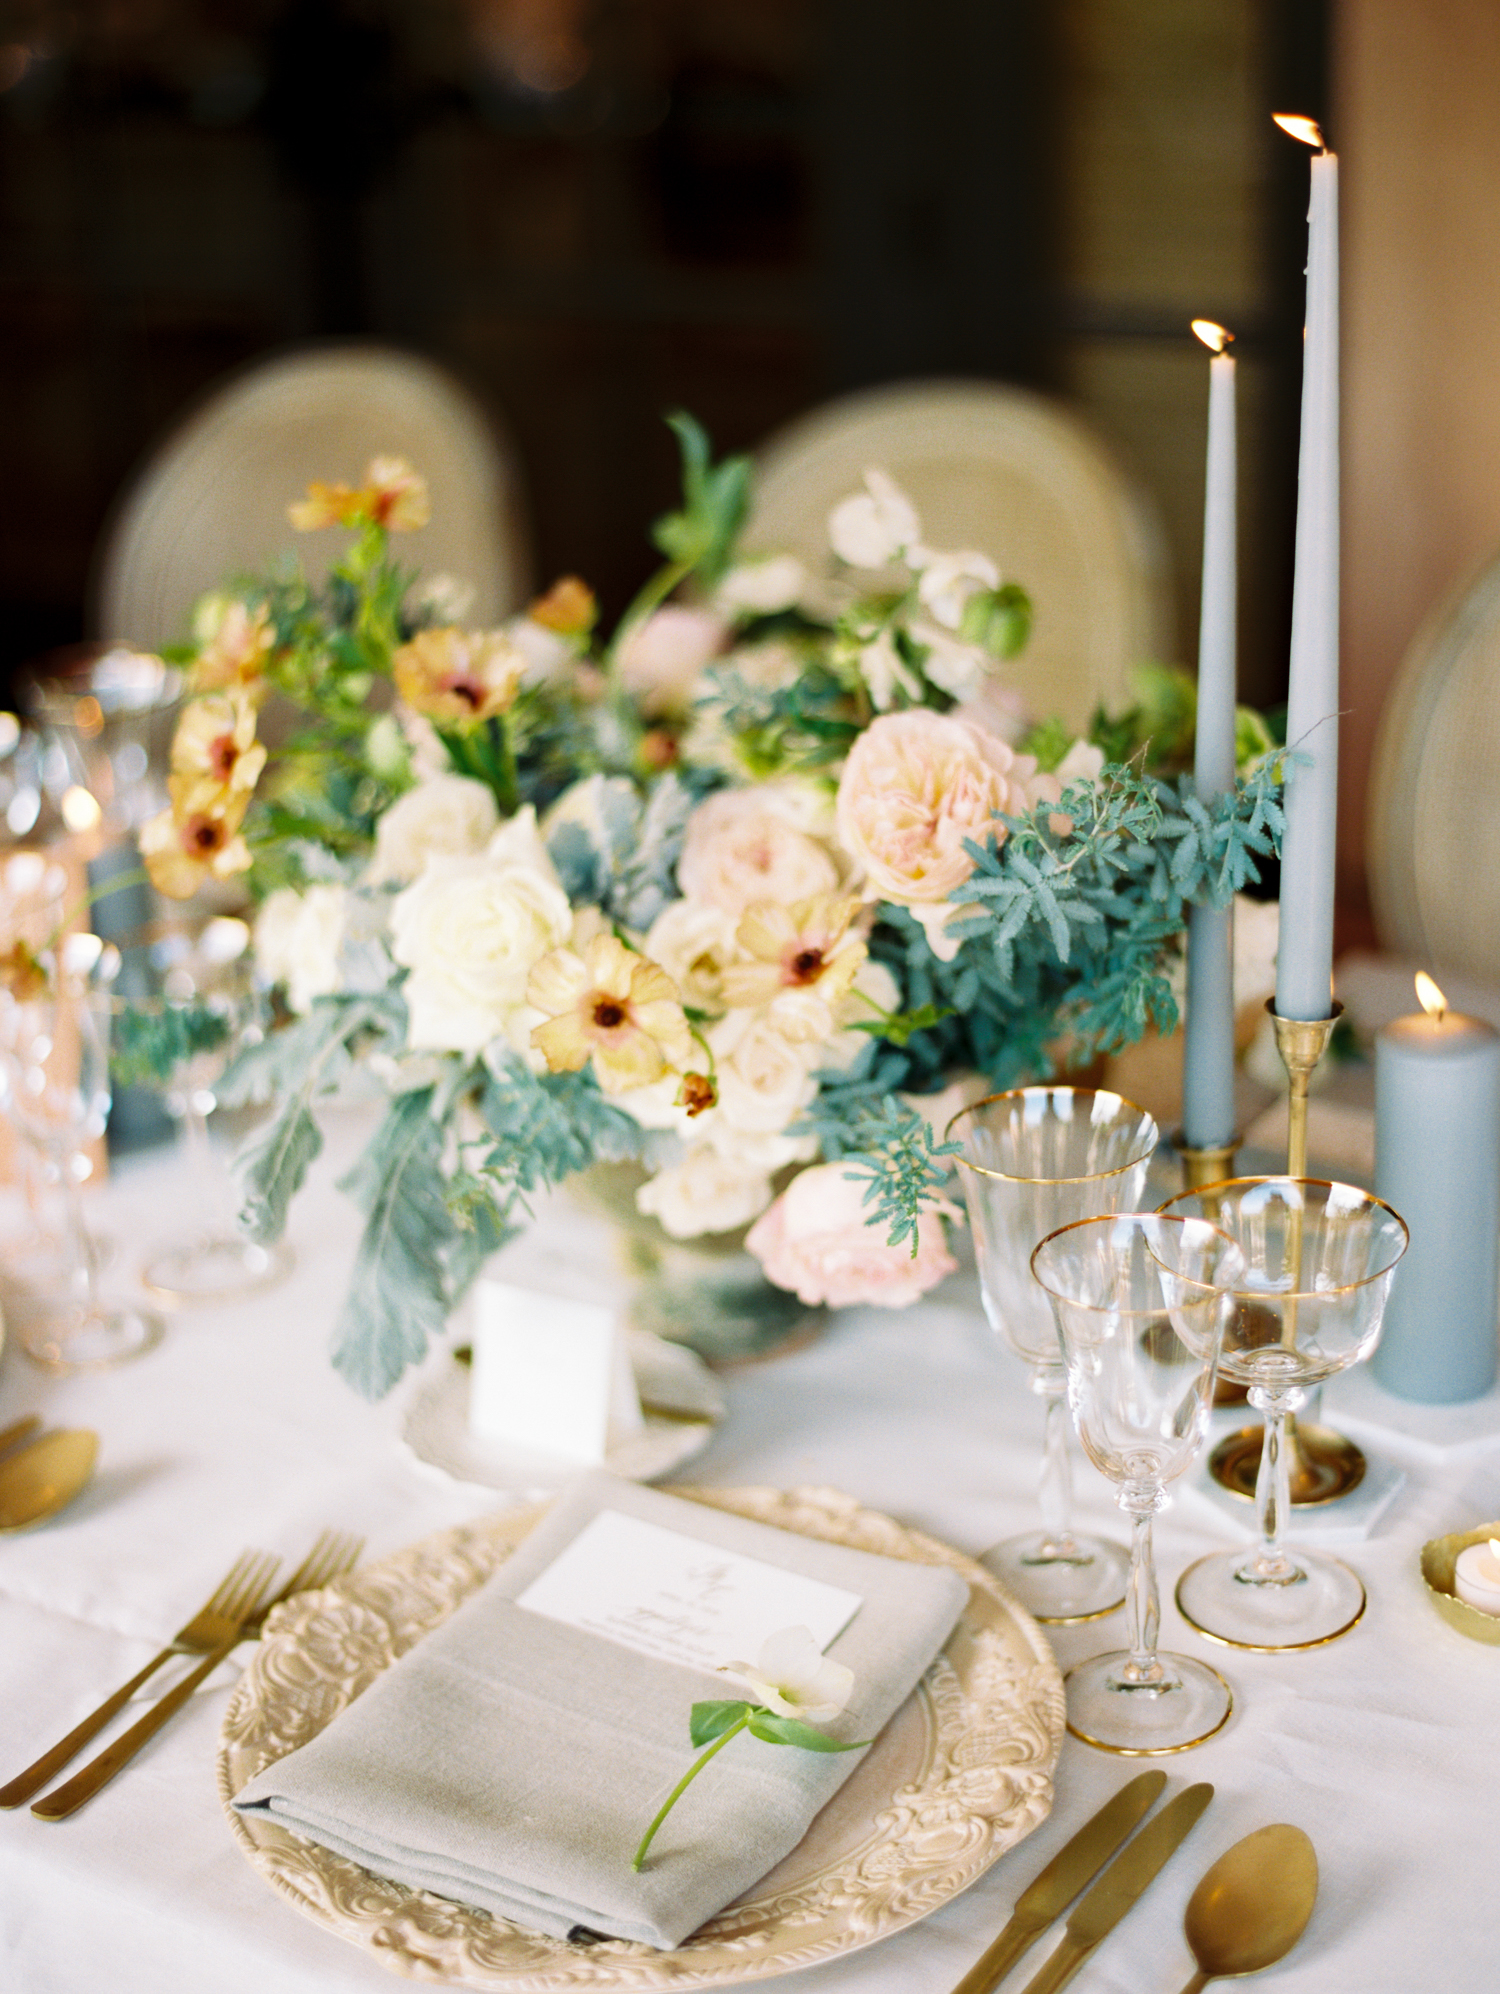 12 Private Estate Wedding Event Design by Joy Proctor.JPG